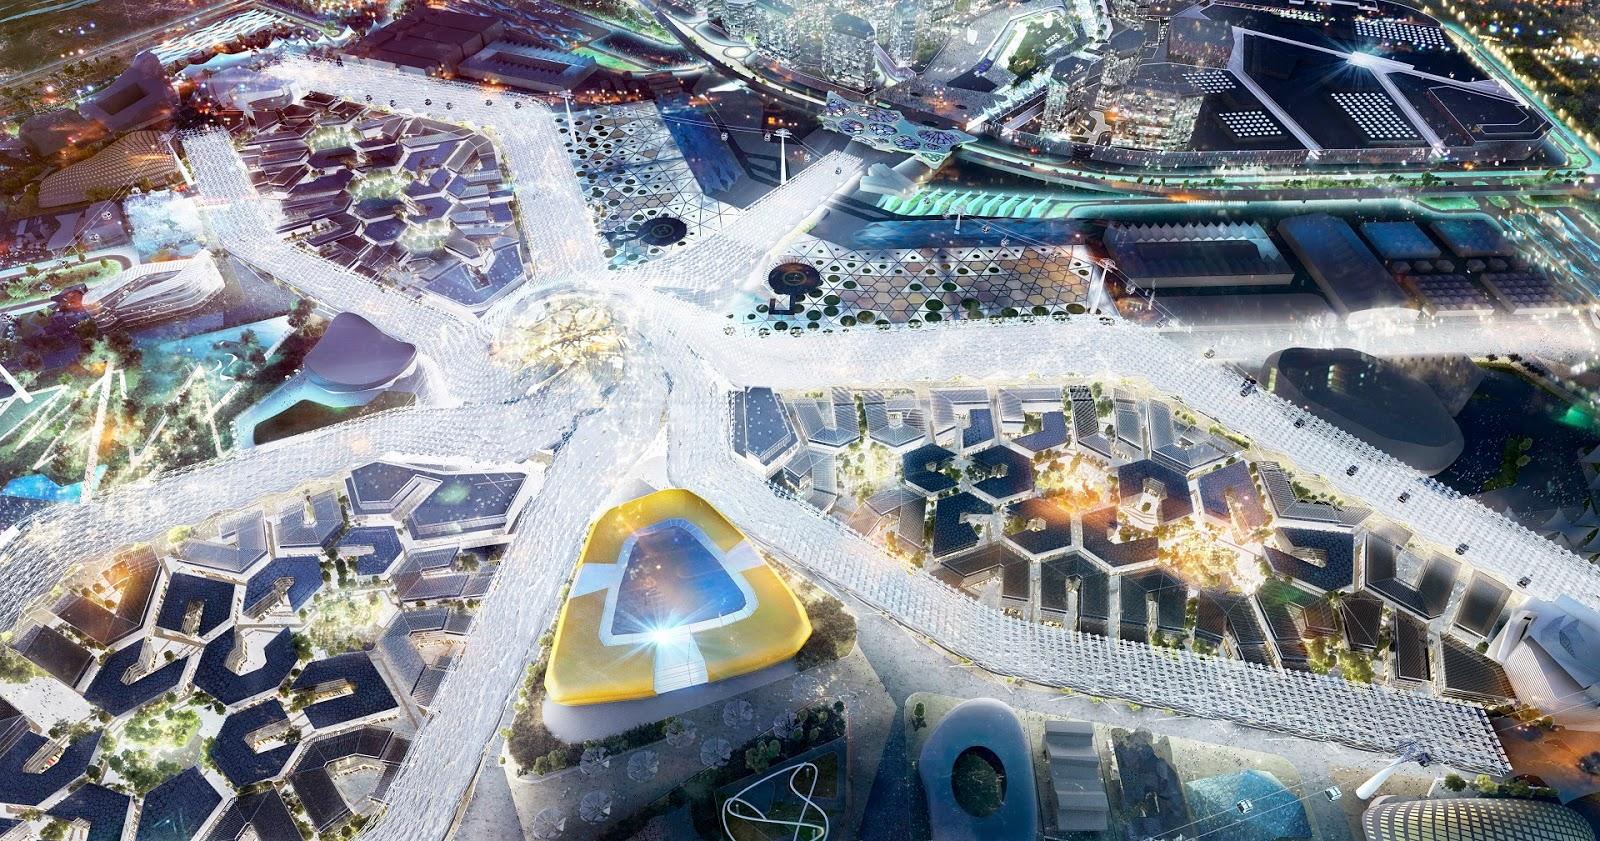 Expo 2020 Dubai UAE Rudy Deighton (10)